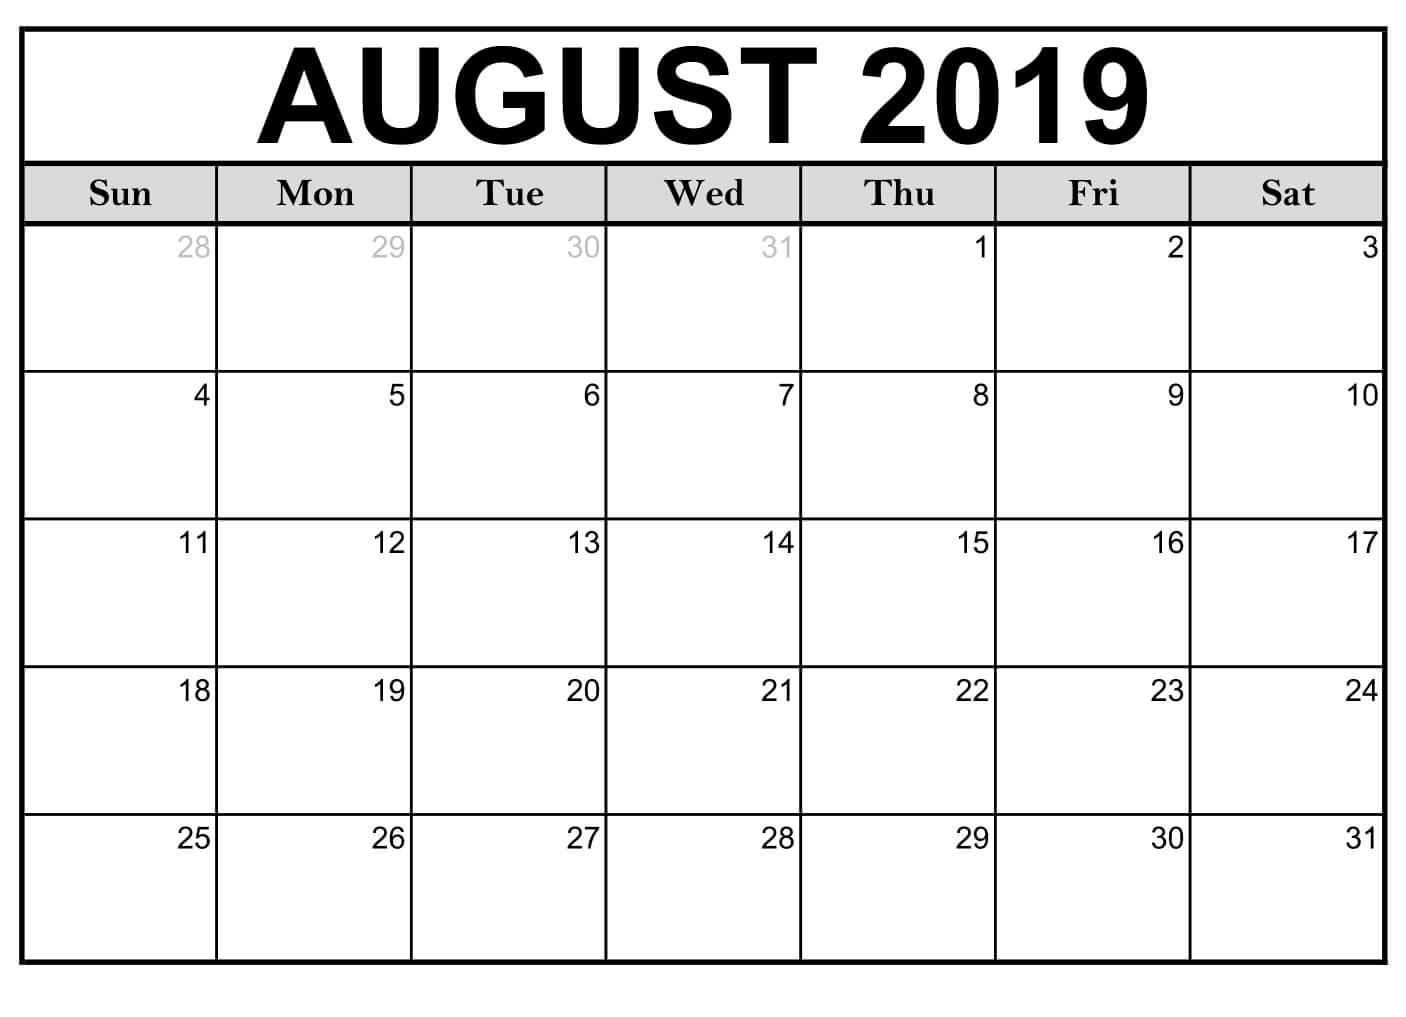 Blank August 2019 Calendar Page - Free Printable Calendar & Template throughout Blank Calendar August Template Australia